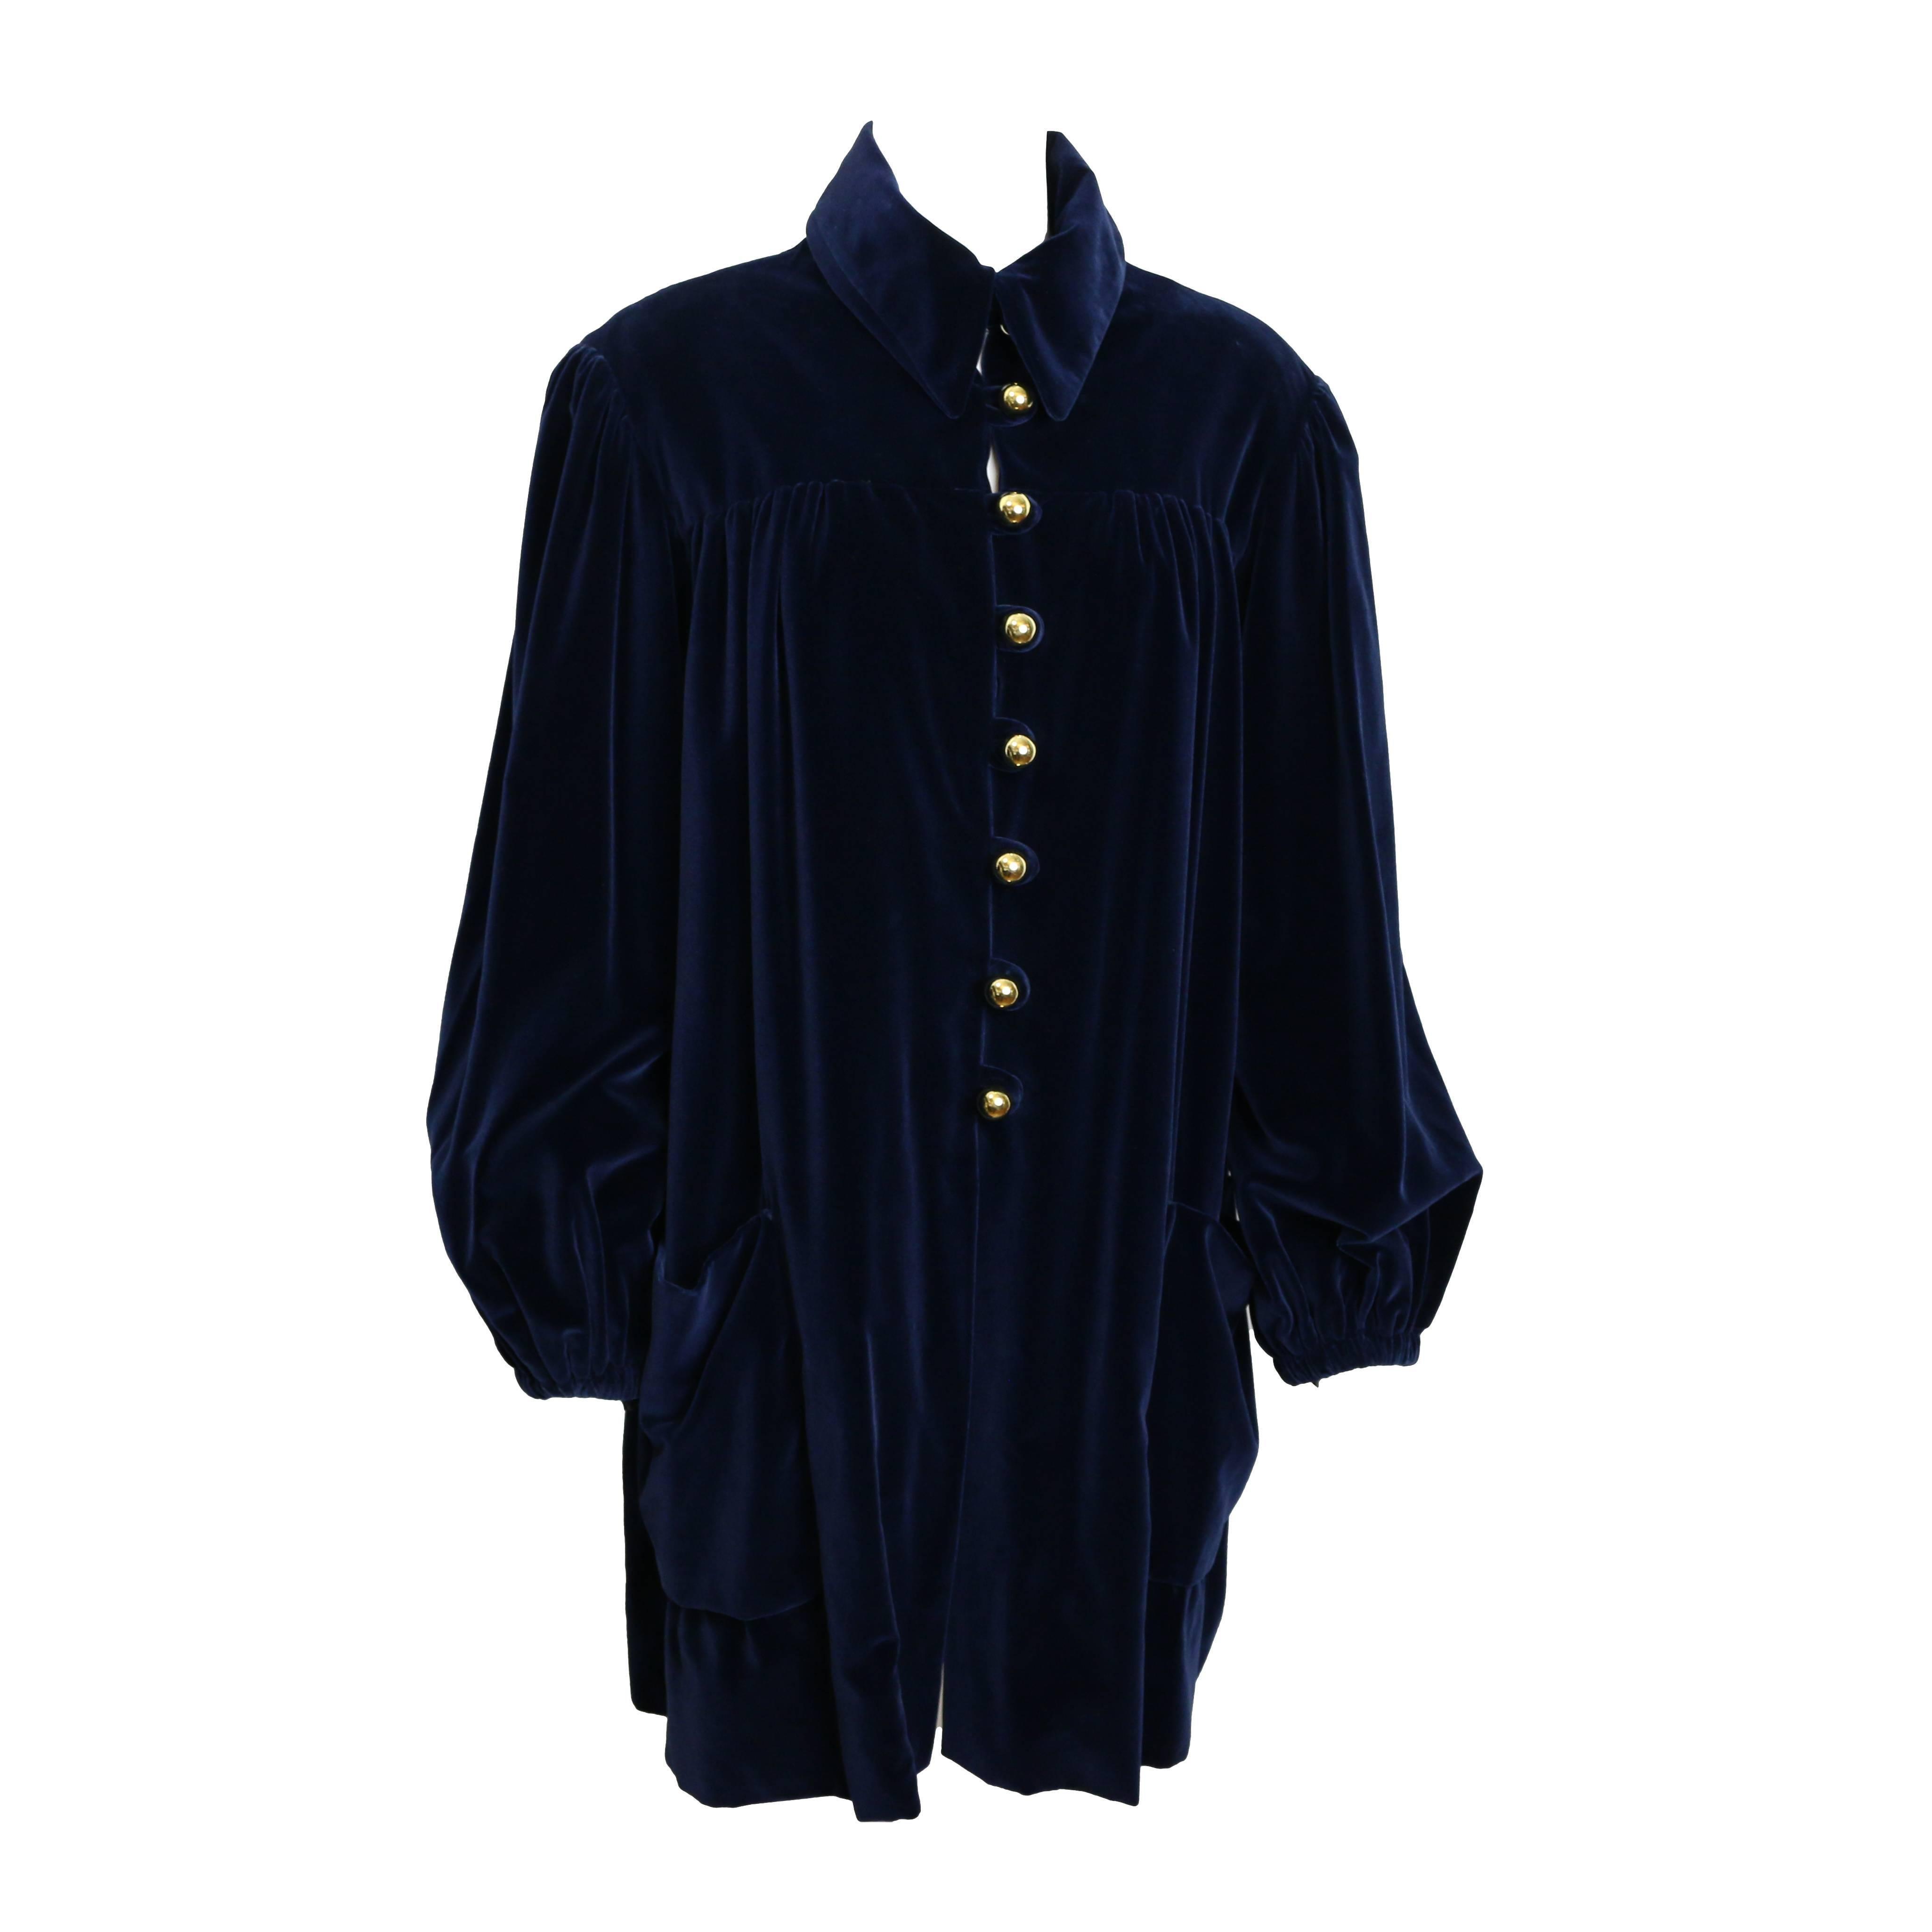 Vintage Moschino Couture Blue Velvet Jacket